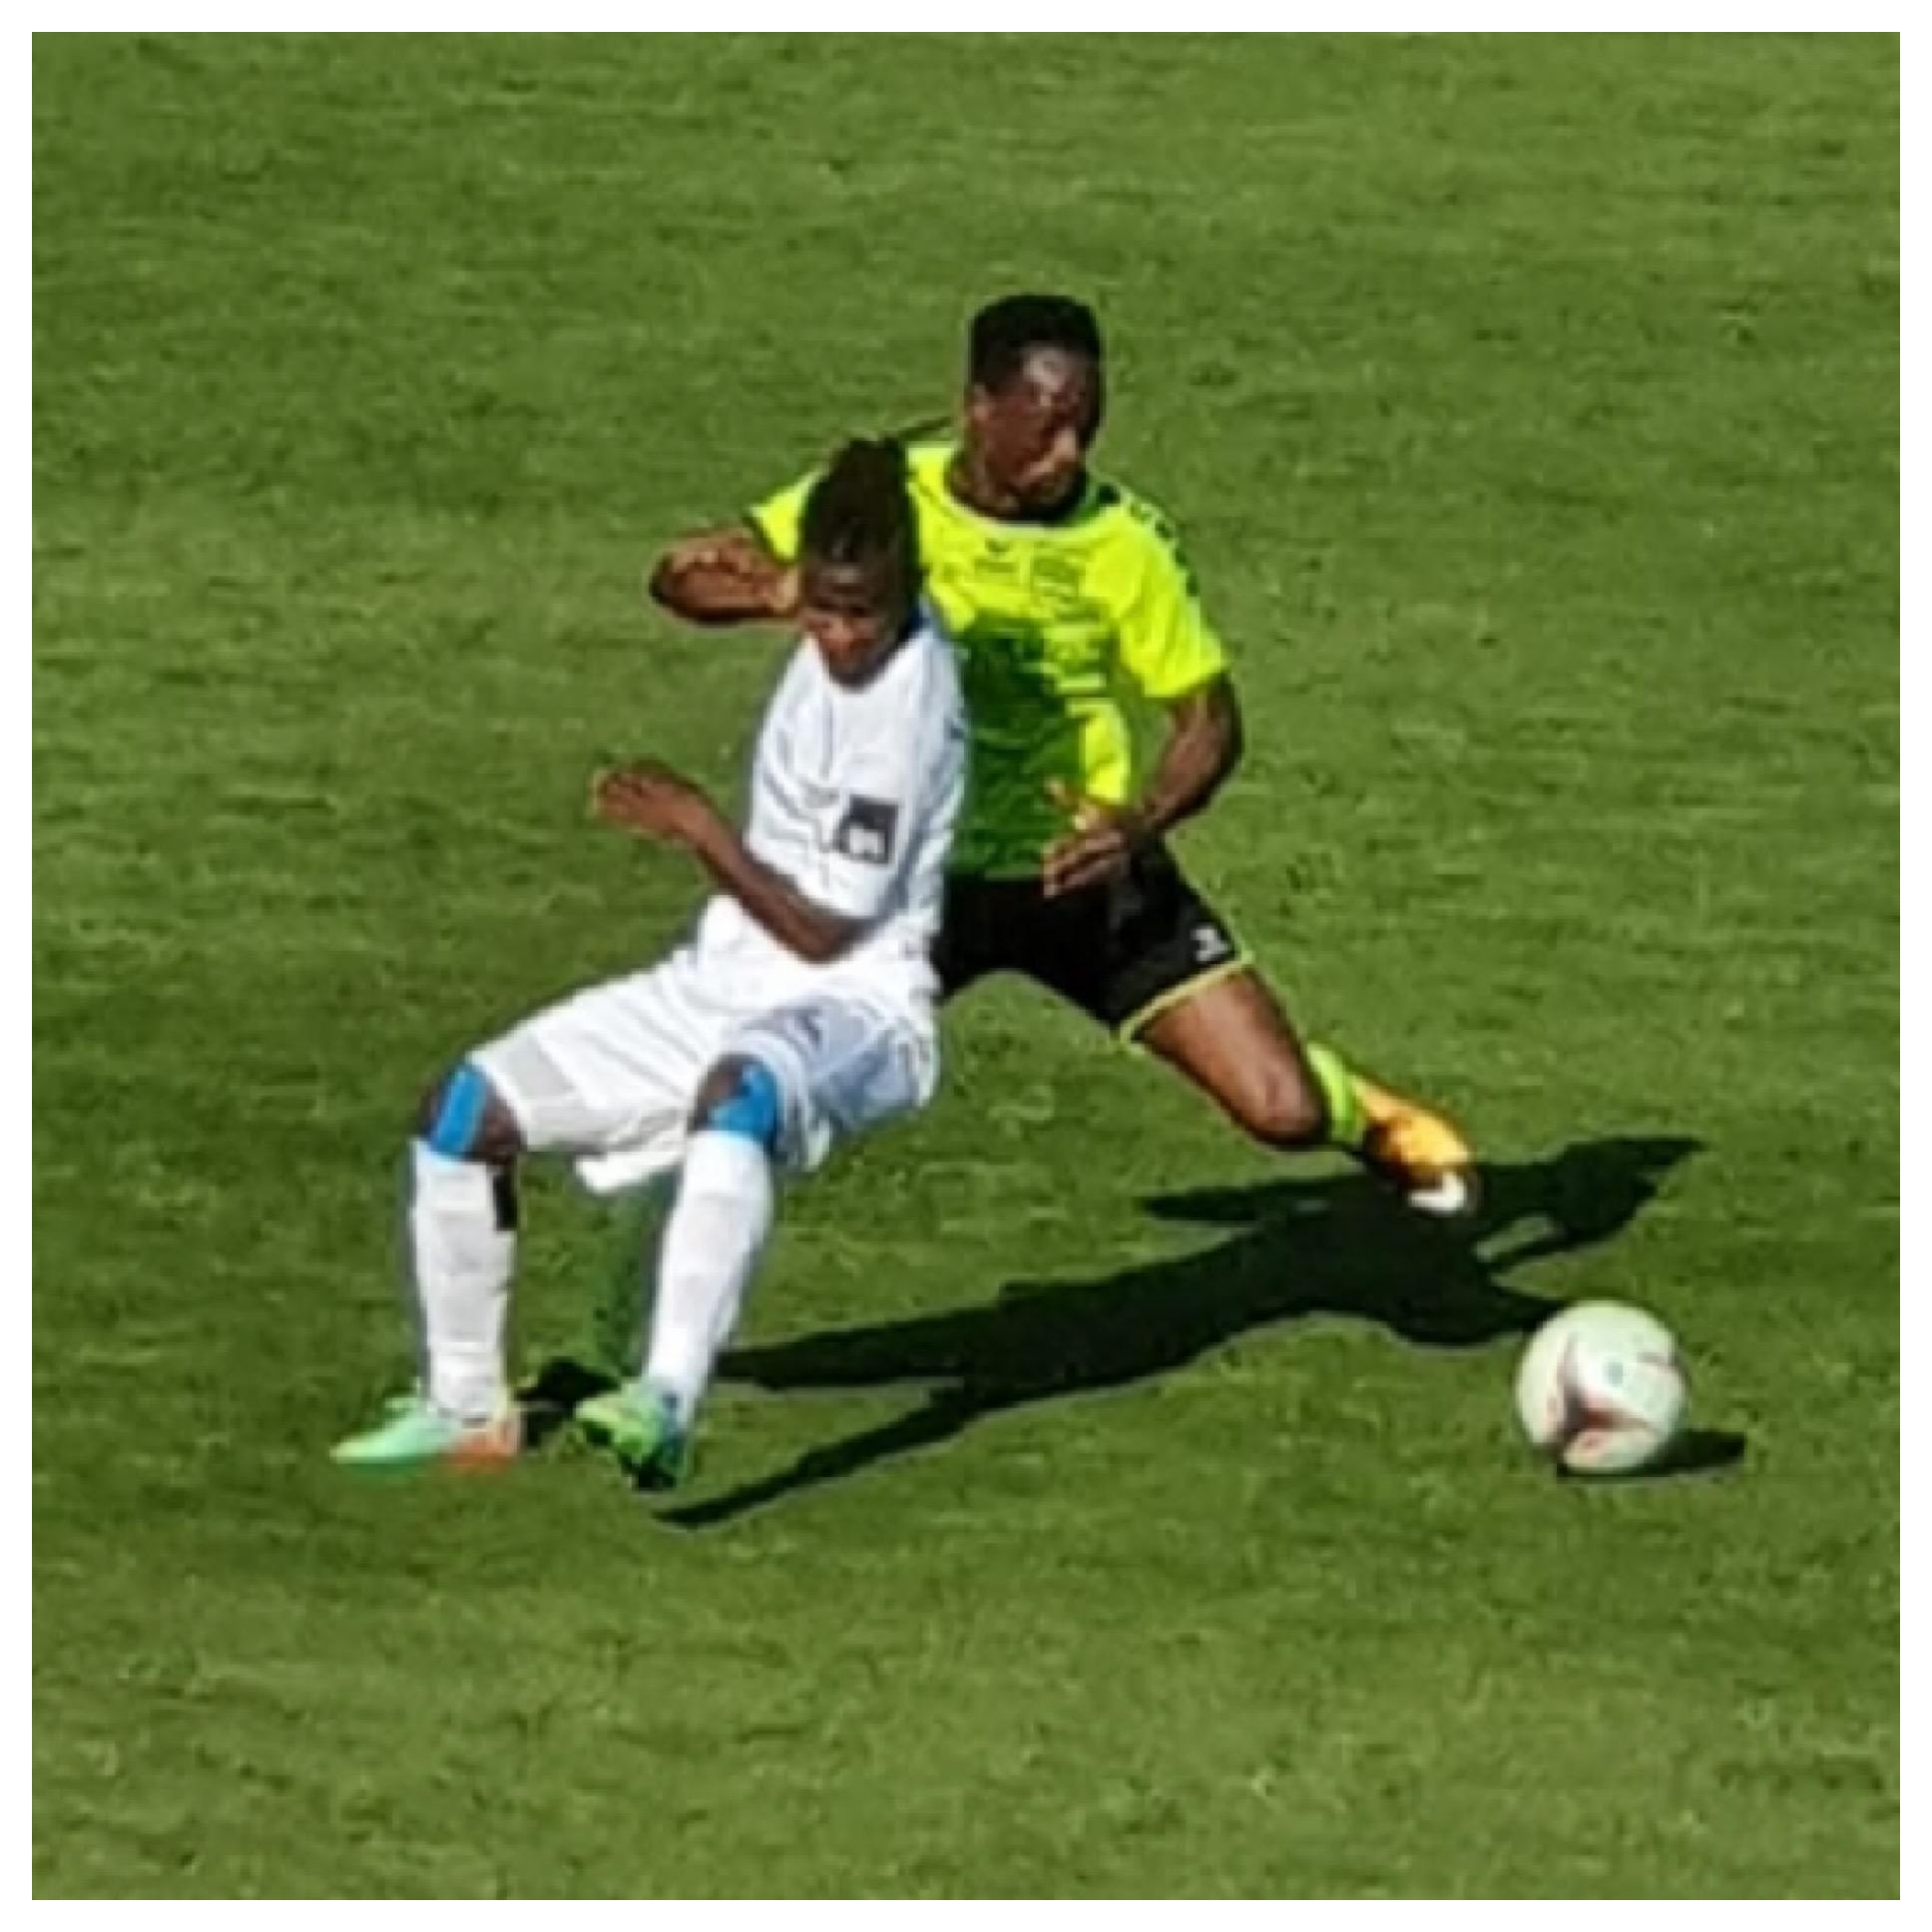 FC Atert Bissen - FC Jeunesse Canach